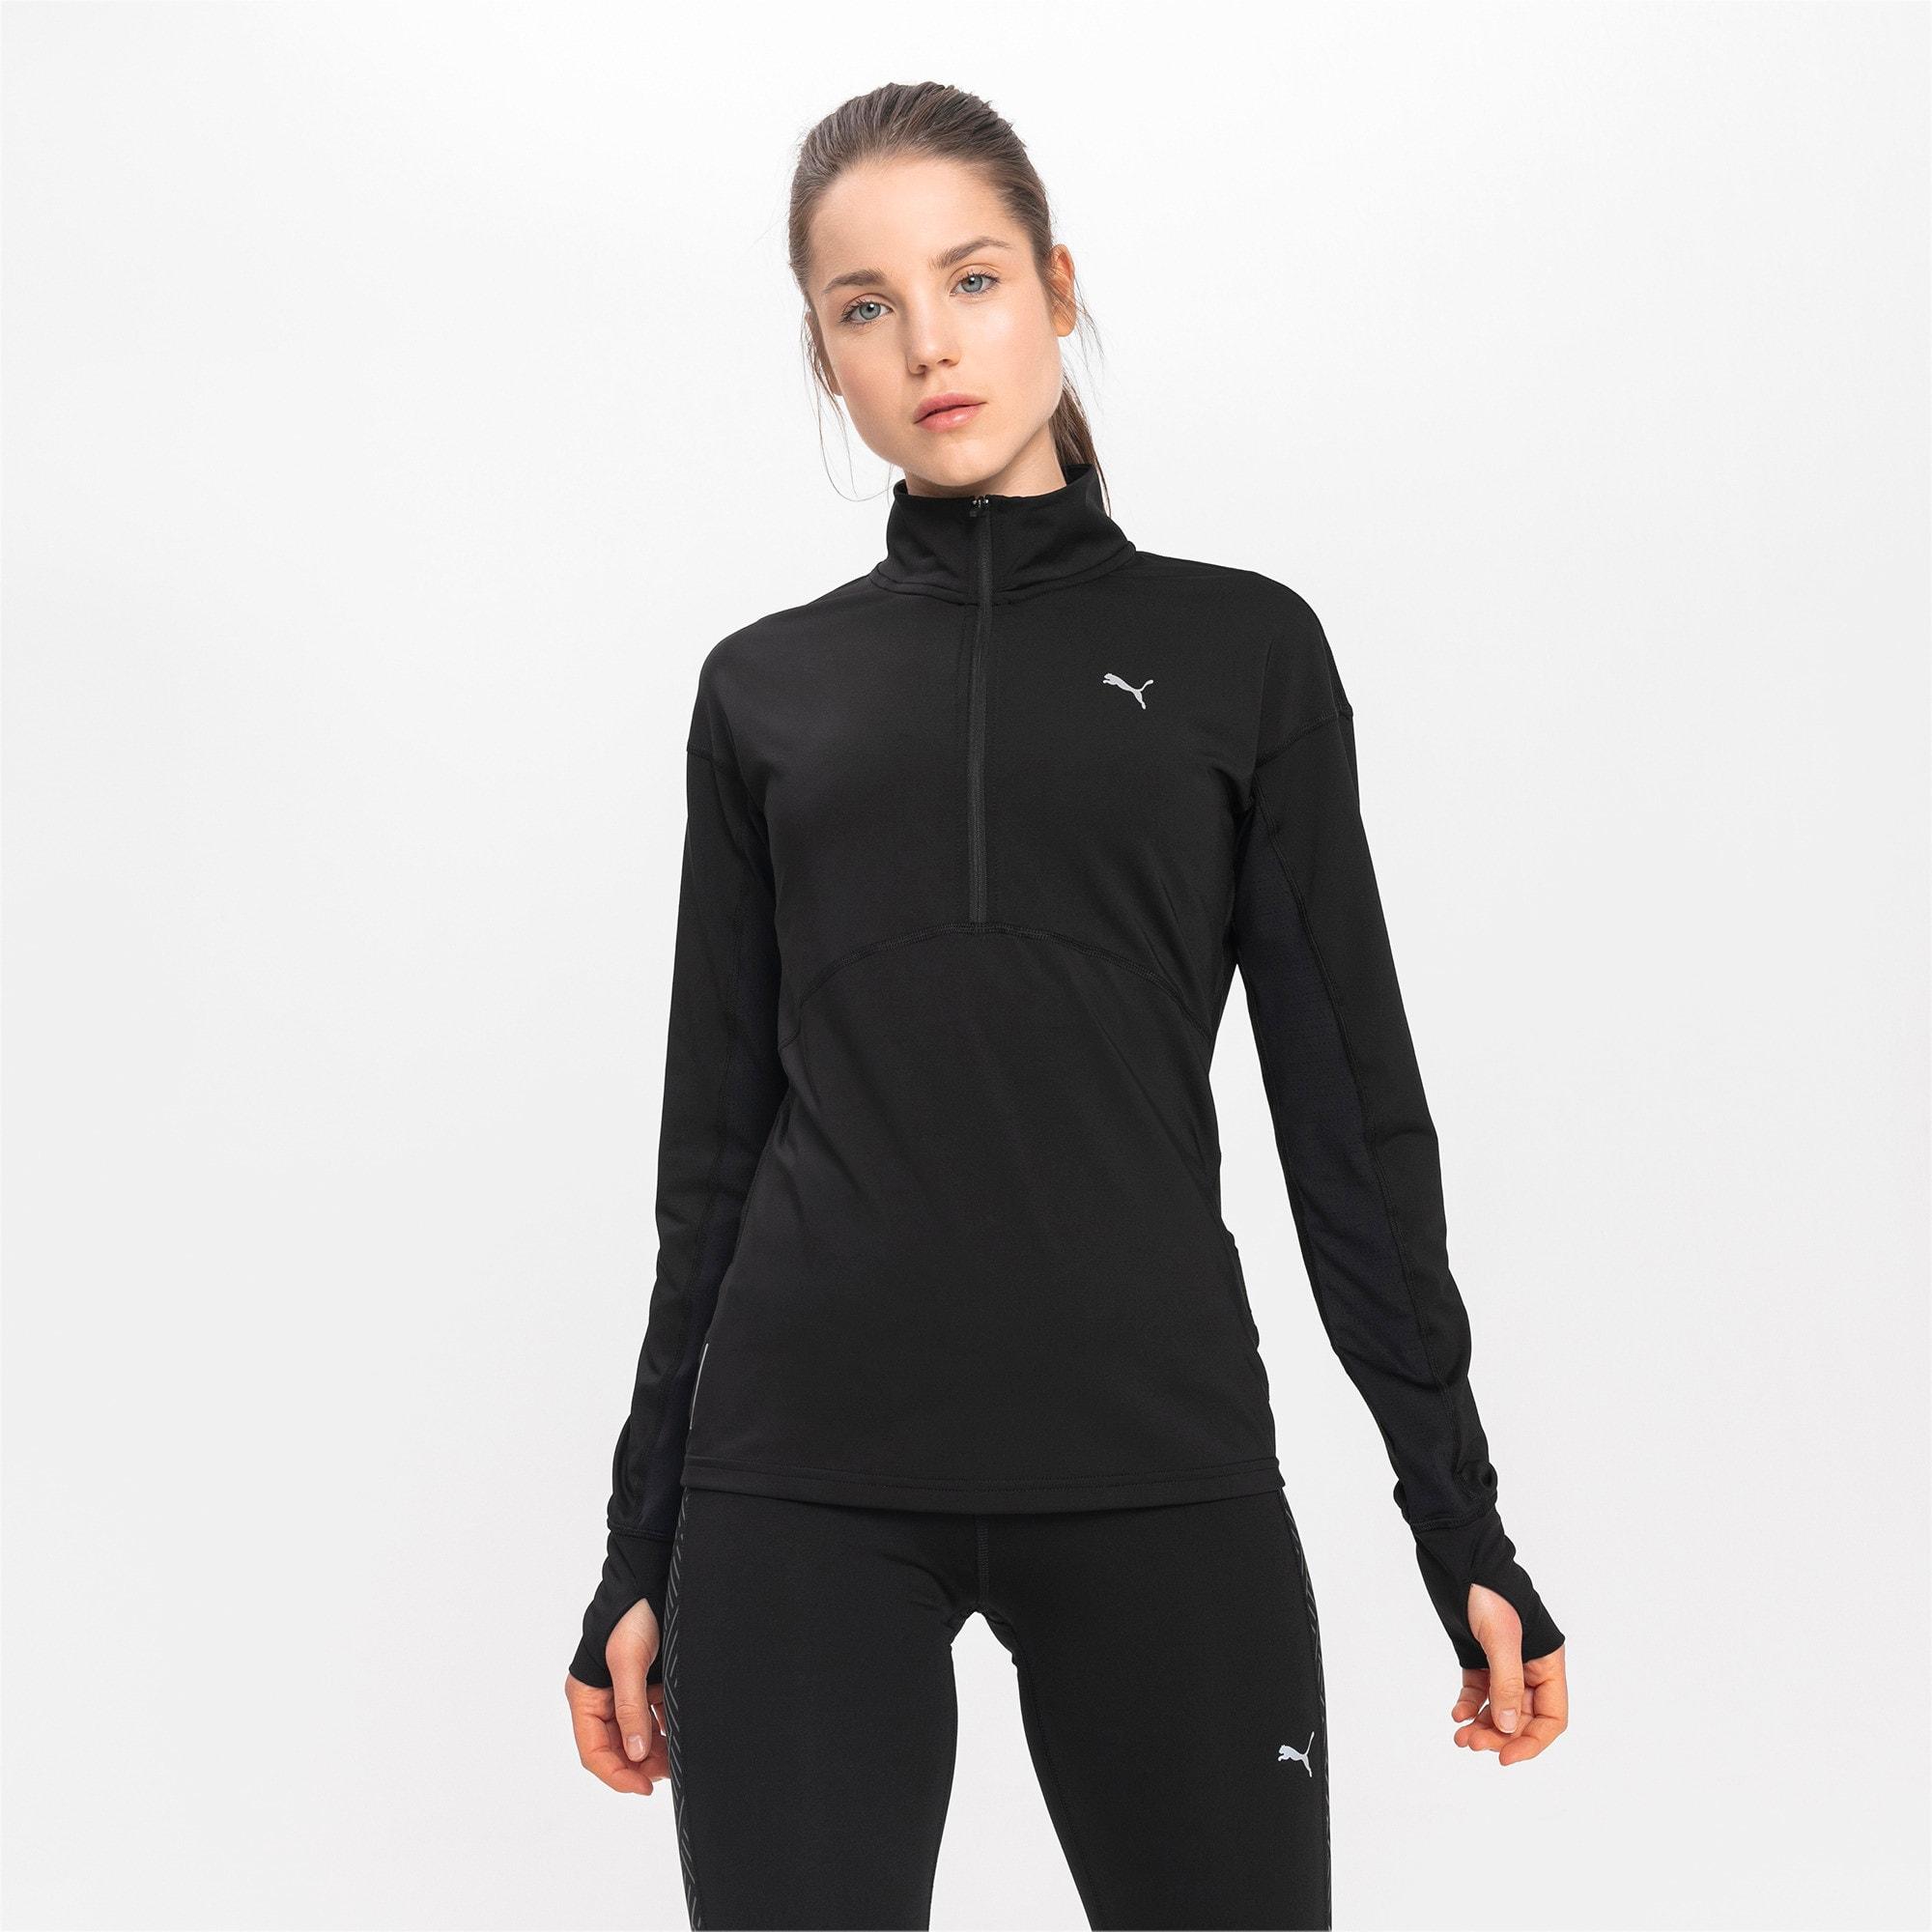 Thumbnail 1 of Ignite Long Sleeve Women's Running Pullover, Puma Black, medium